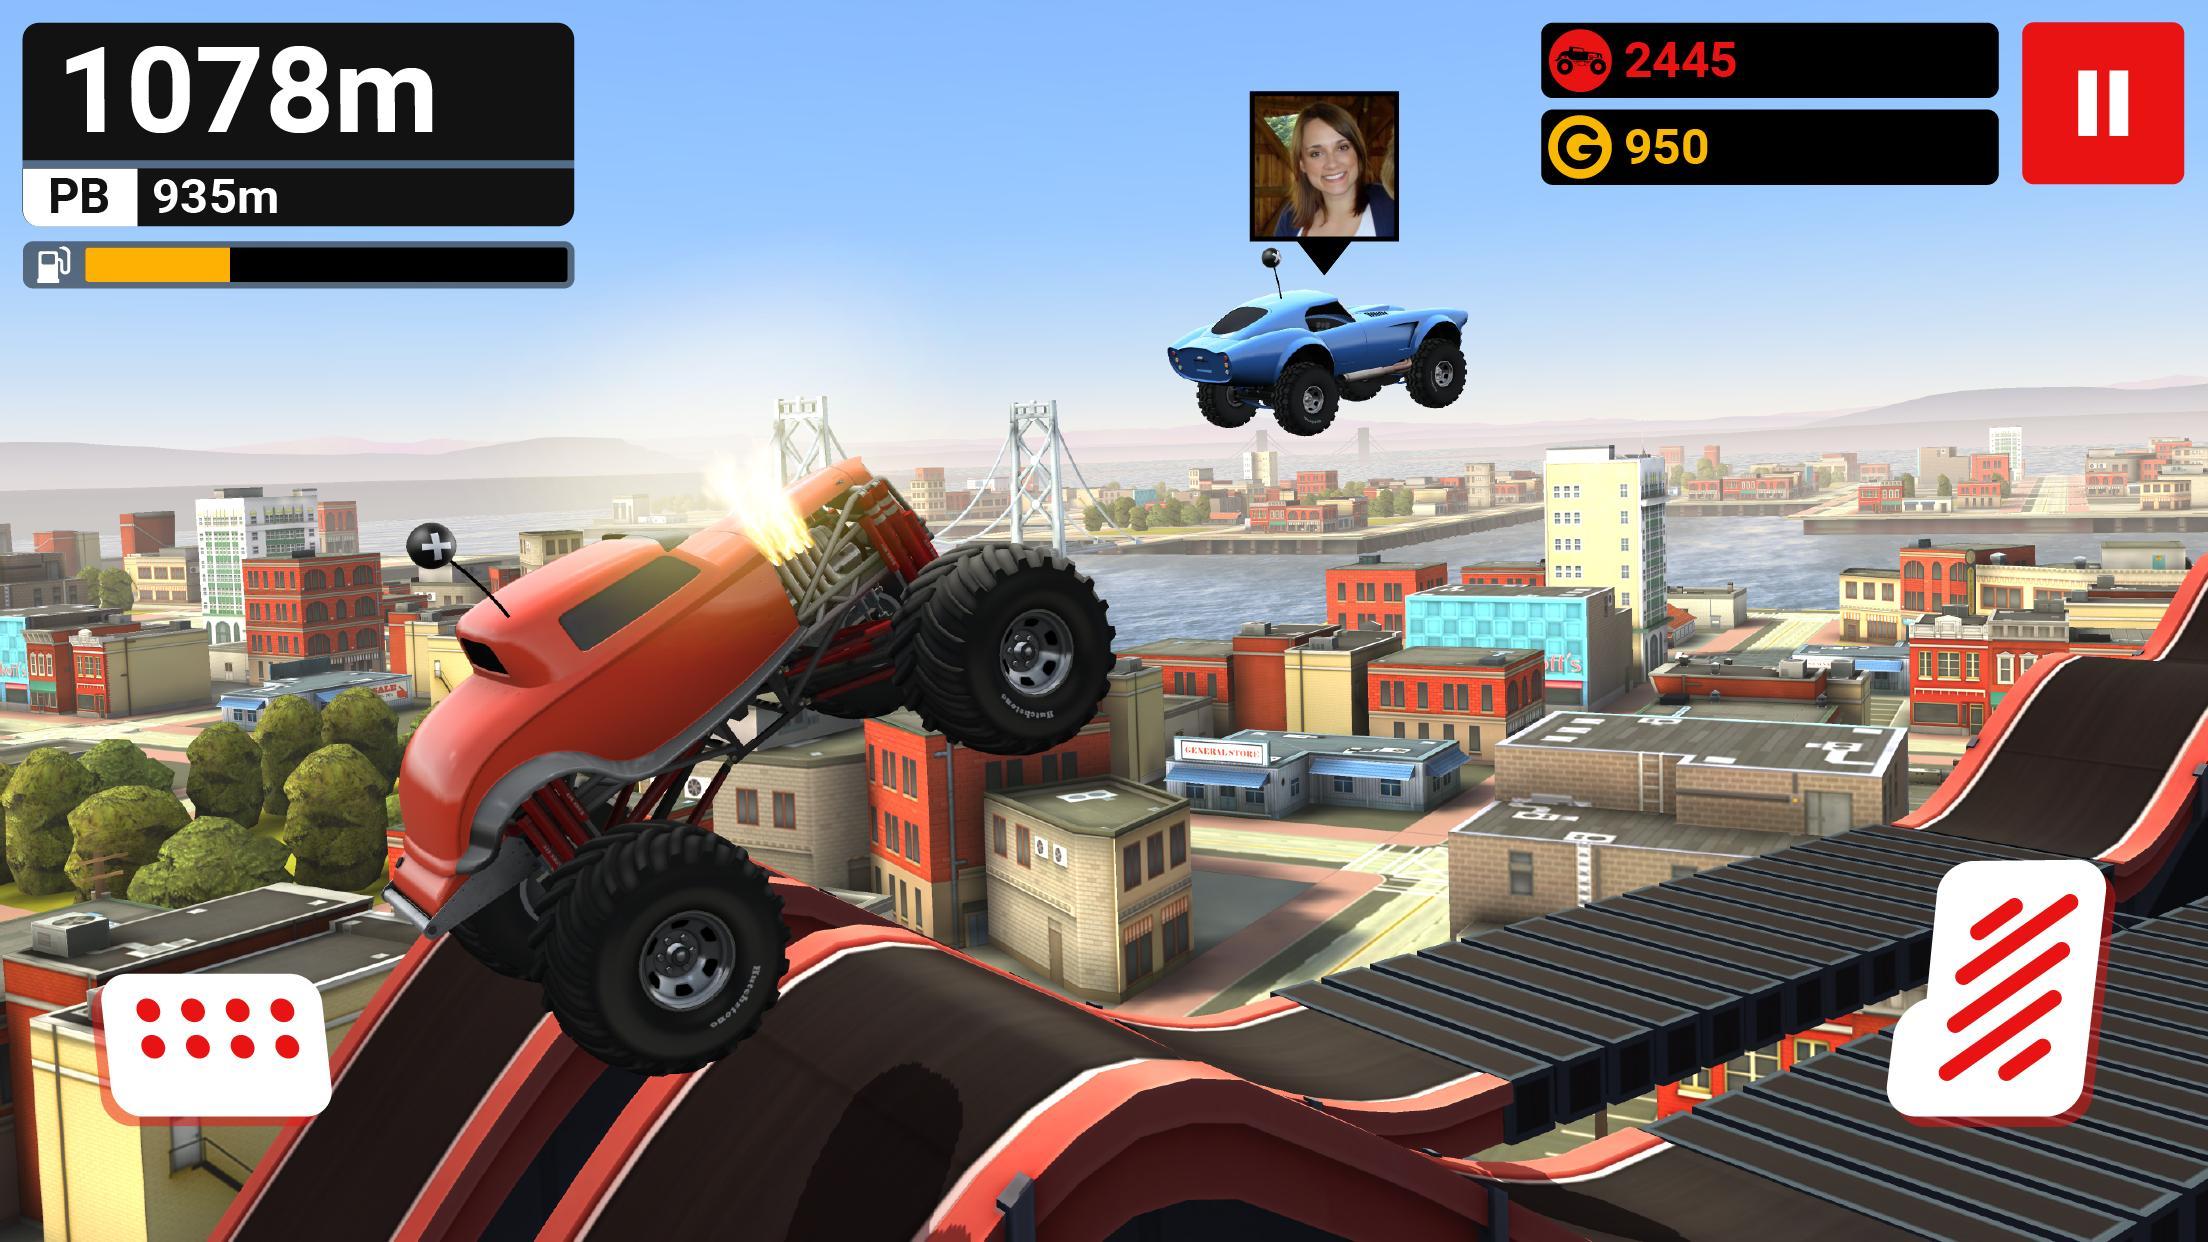 MMX Hill Dash 1.11626 Screenshot 1